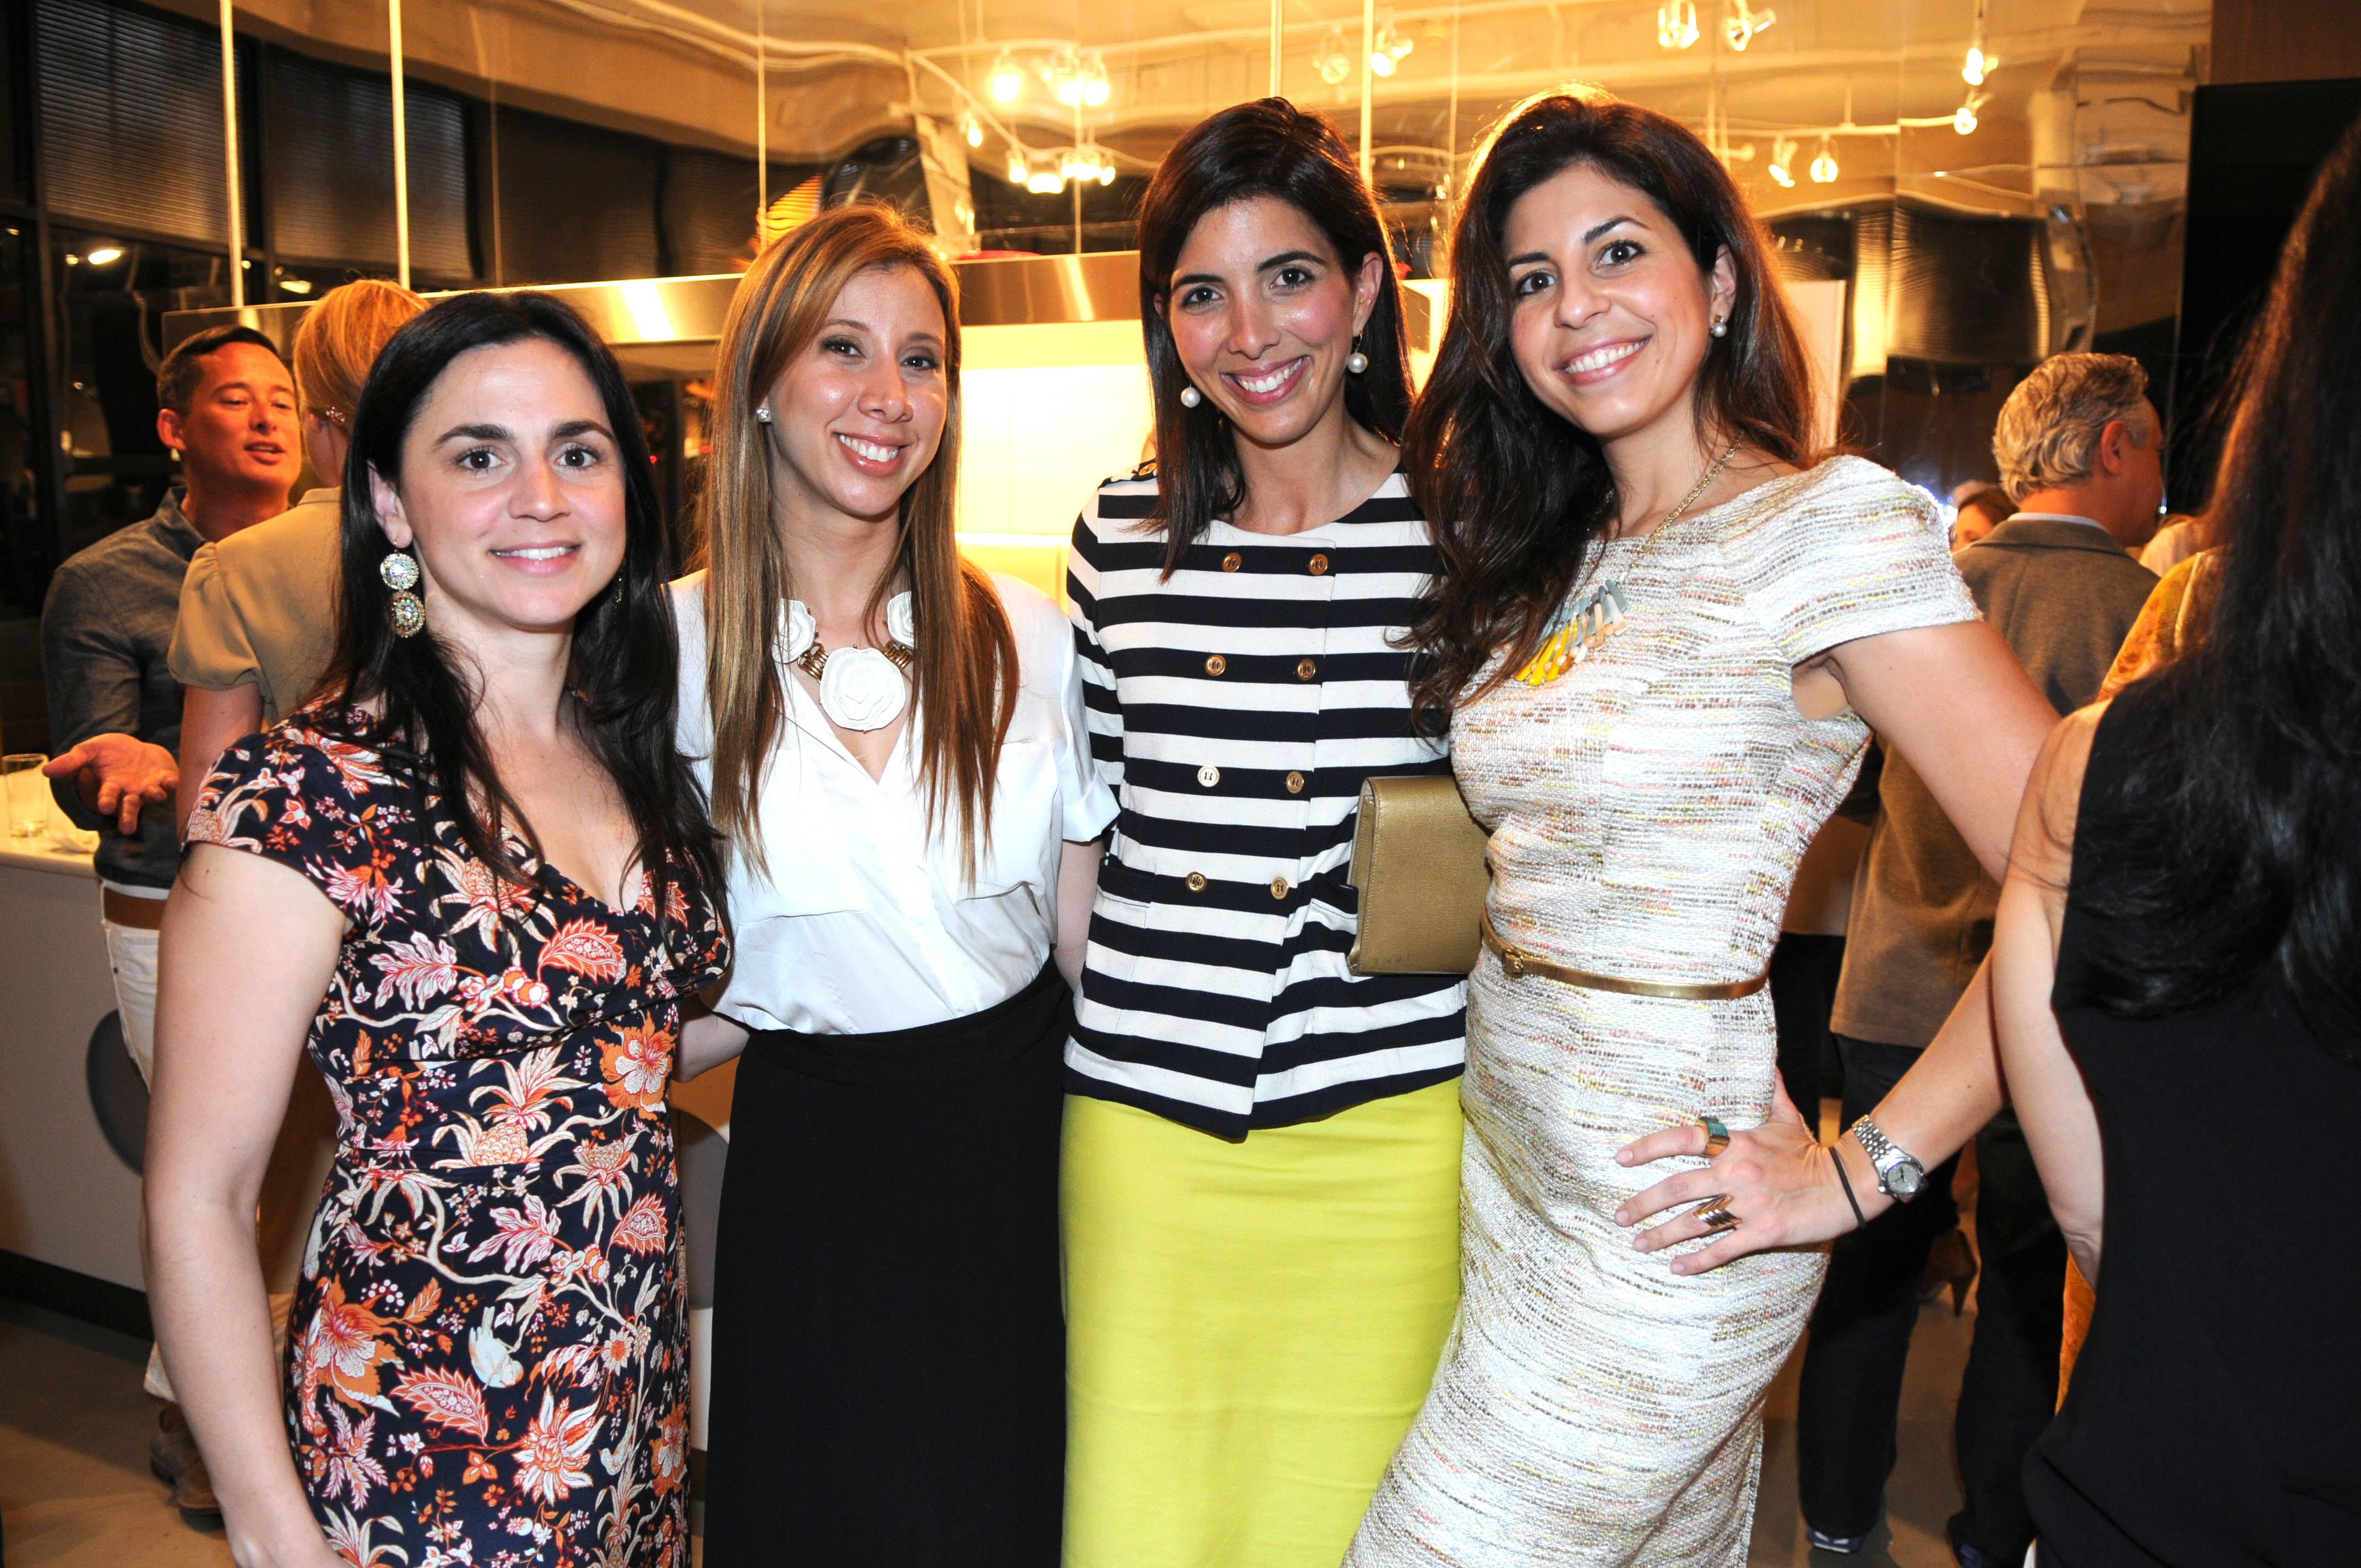 Ali Codina, Cristina Ben-Shmuel, Carolina Menendez, Annette Lopez